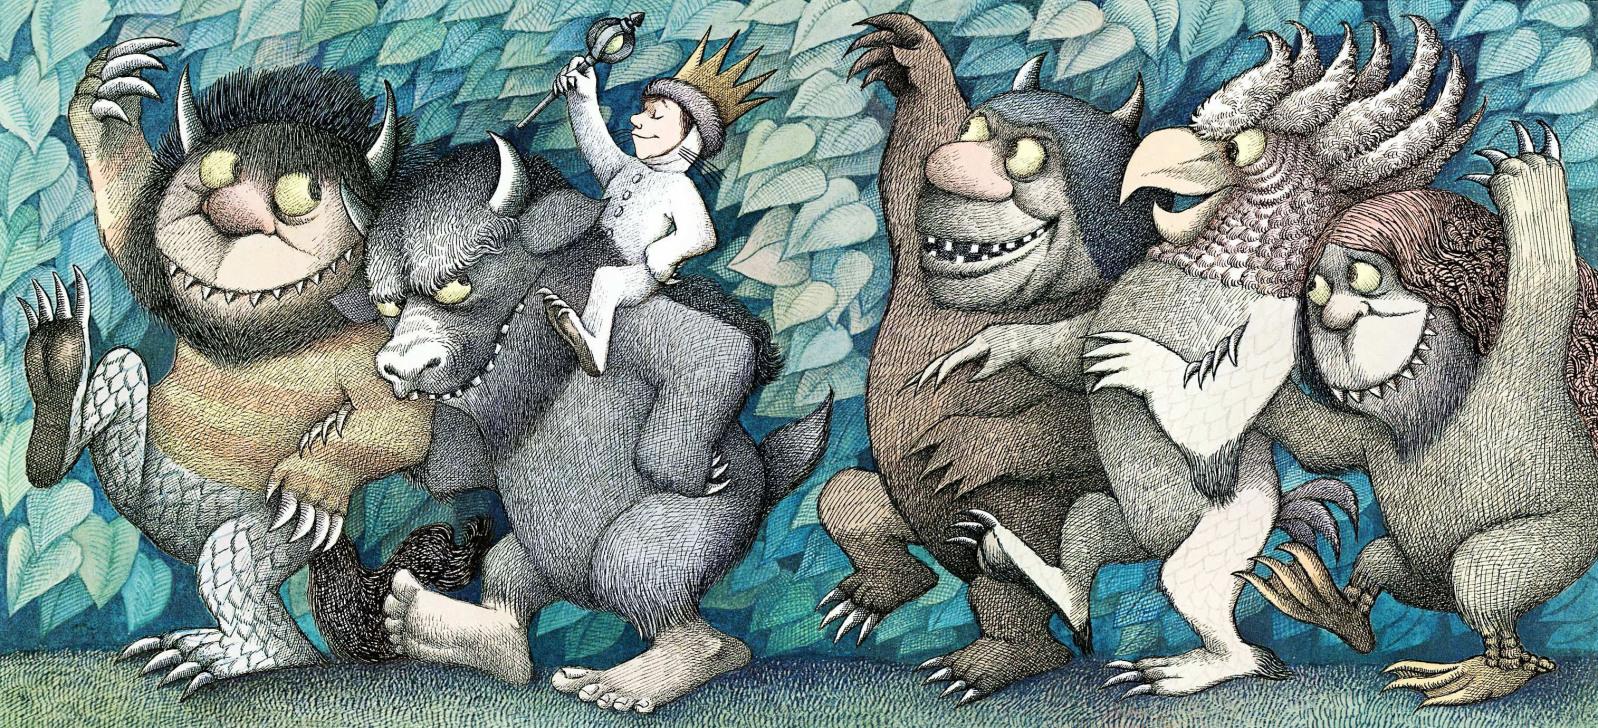 * Where The Wild Things Are 作者Maurice Sendak逝世:回野獸國當國王了! 1